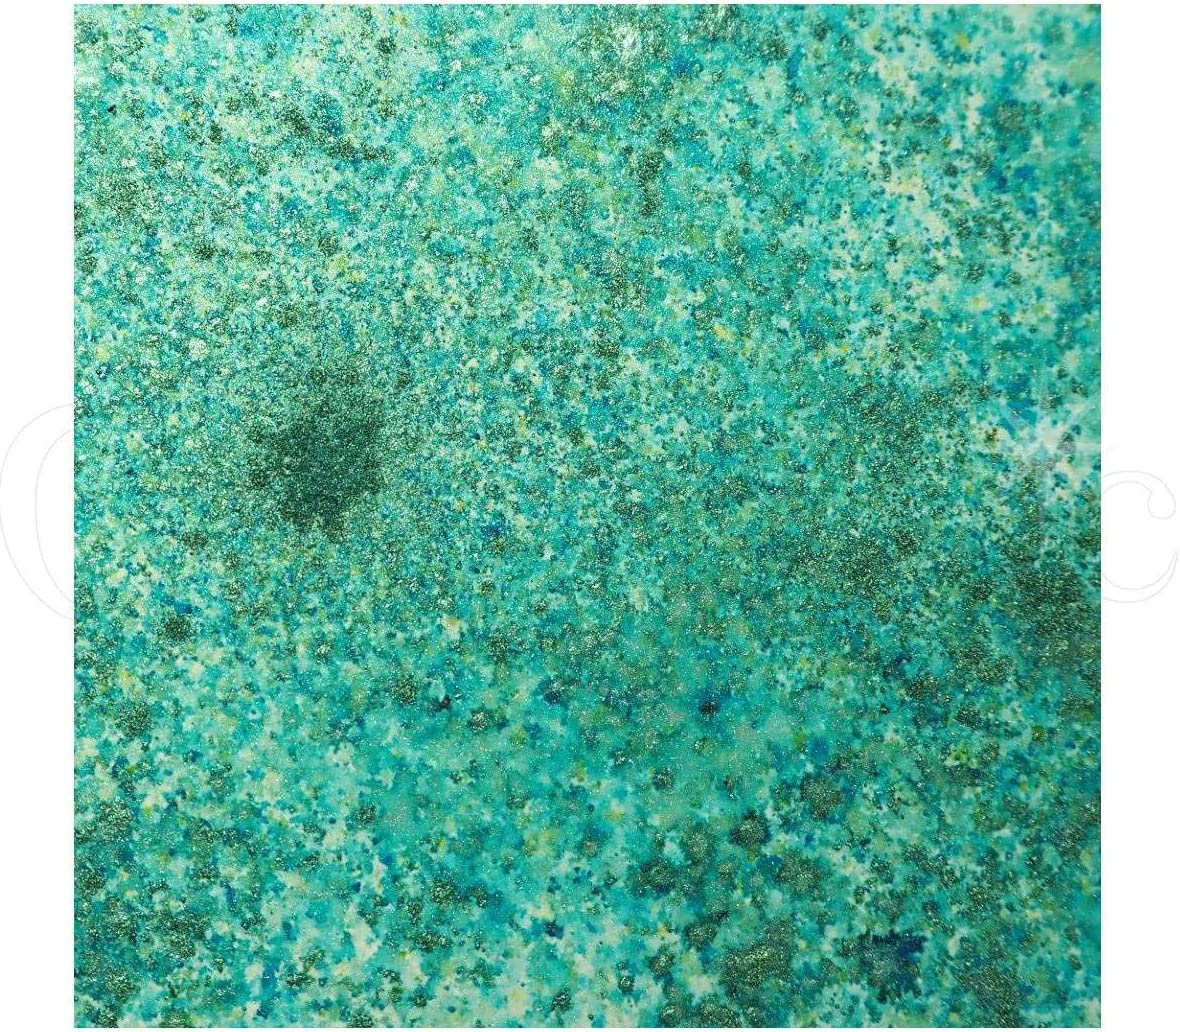 8.8/x 3/x 3/cm smaragd gr/ün Mica und Dye Tinte Pigment Cosmic Shimmer Pixie Puder